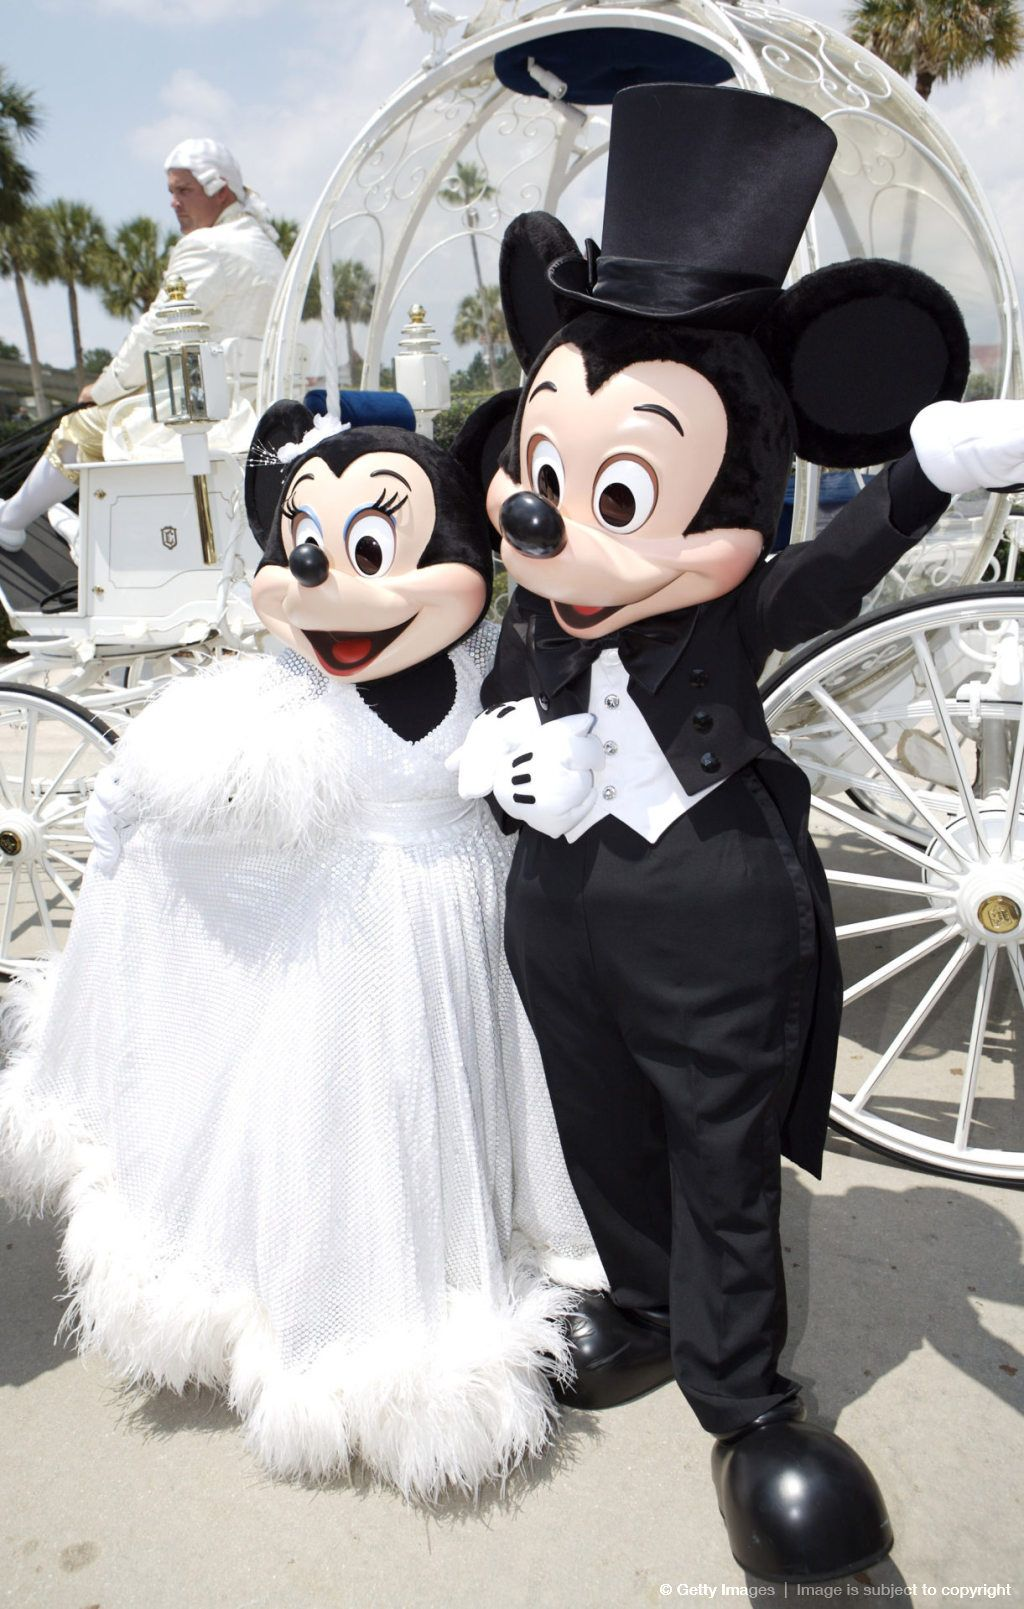 mickey and minnie, wedding | ディズニー | pinterest | ディズニー